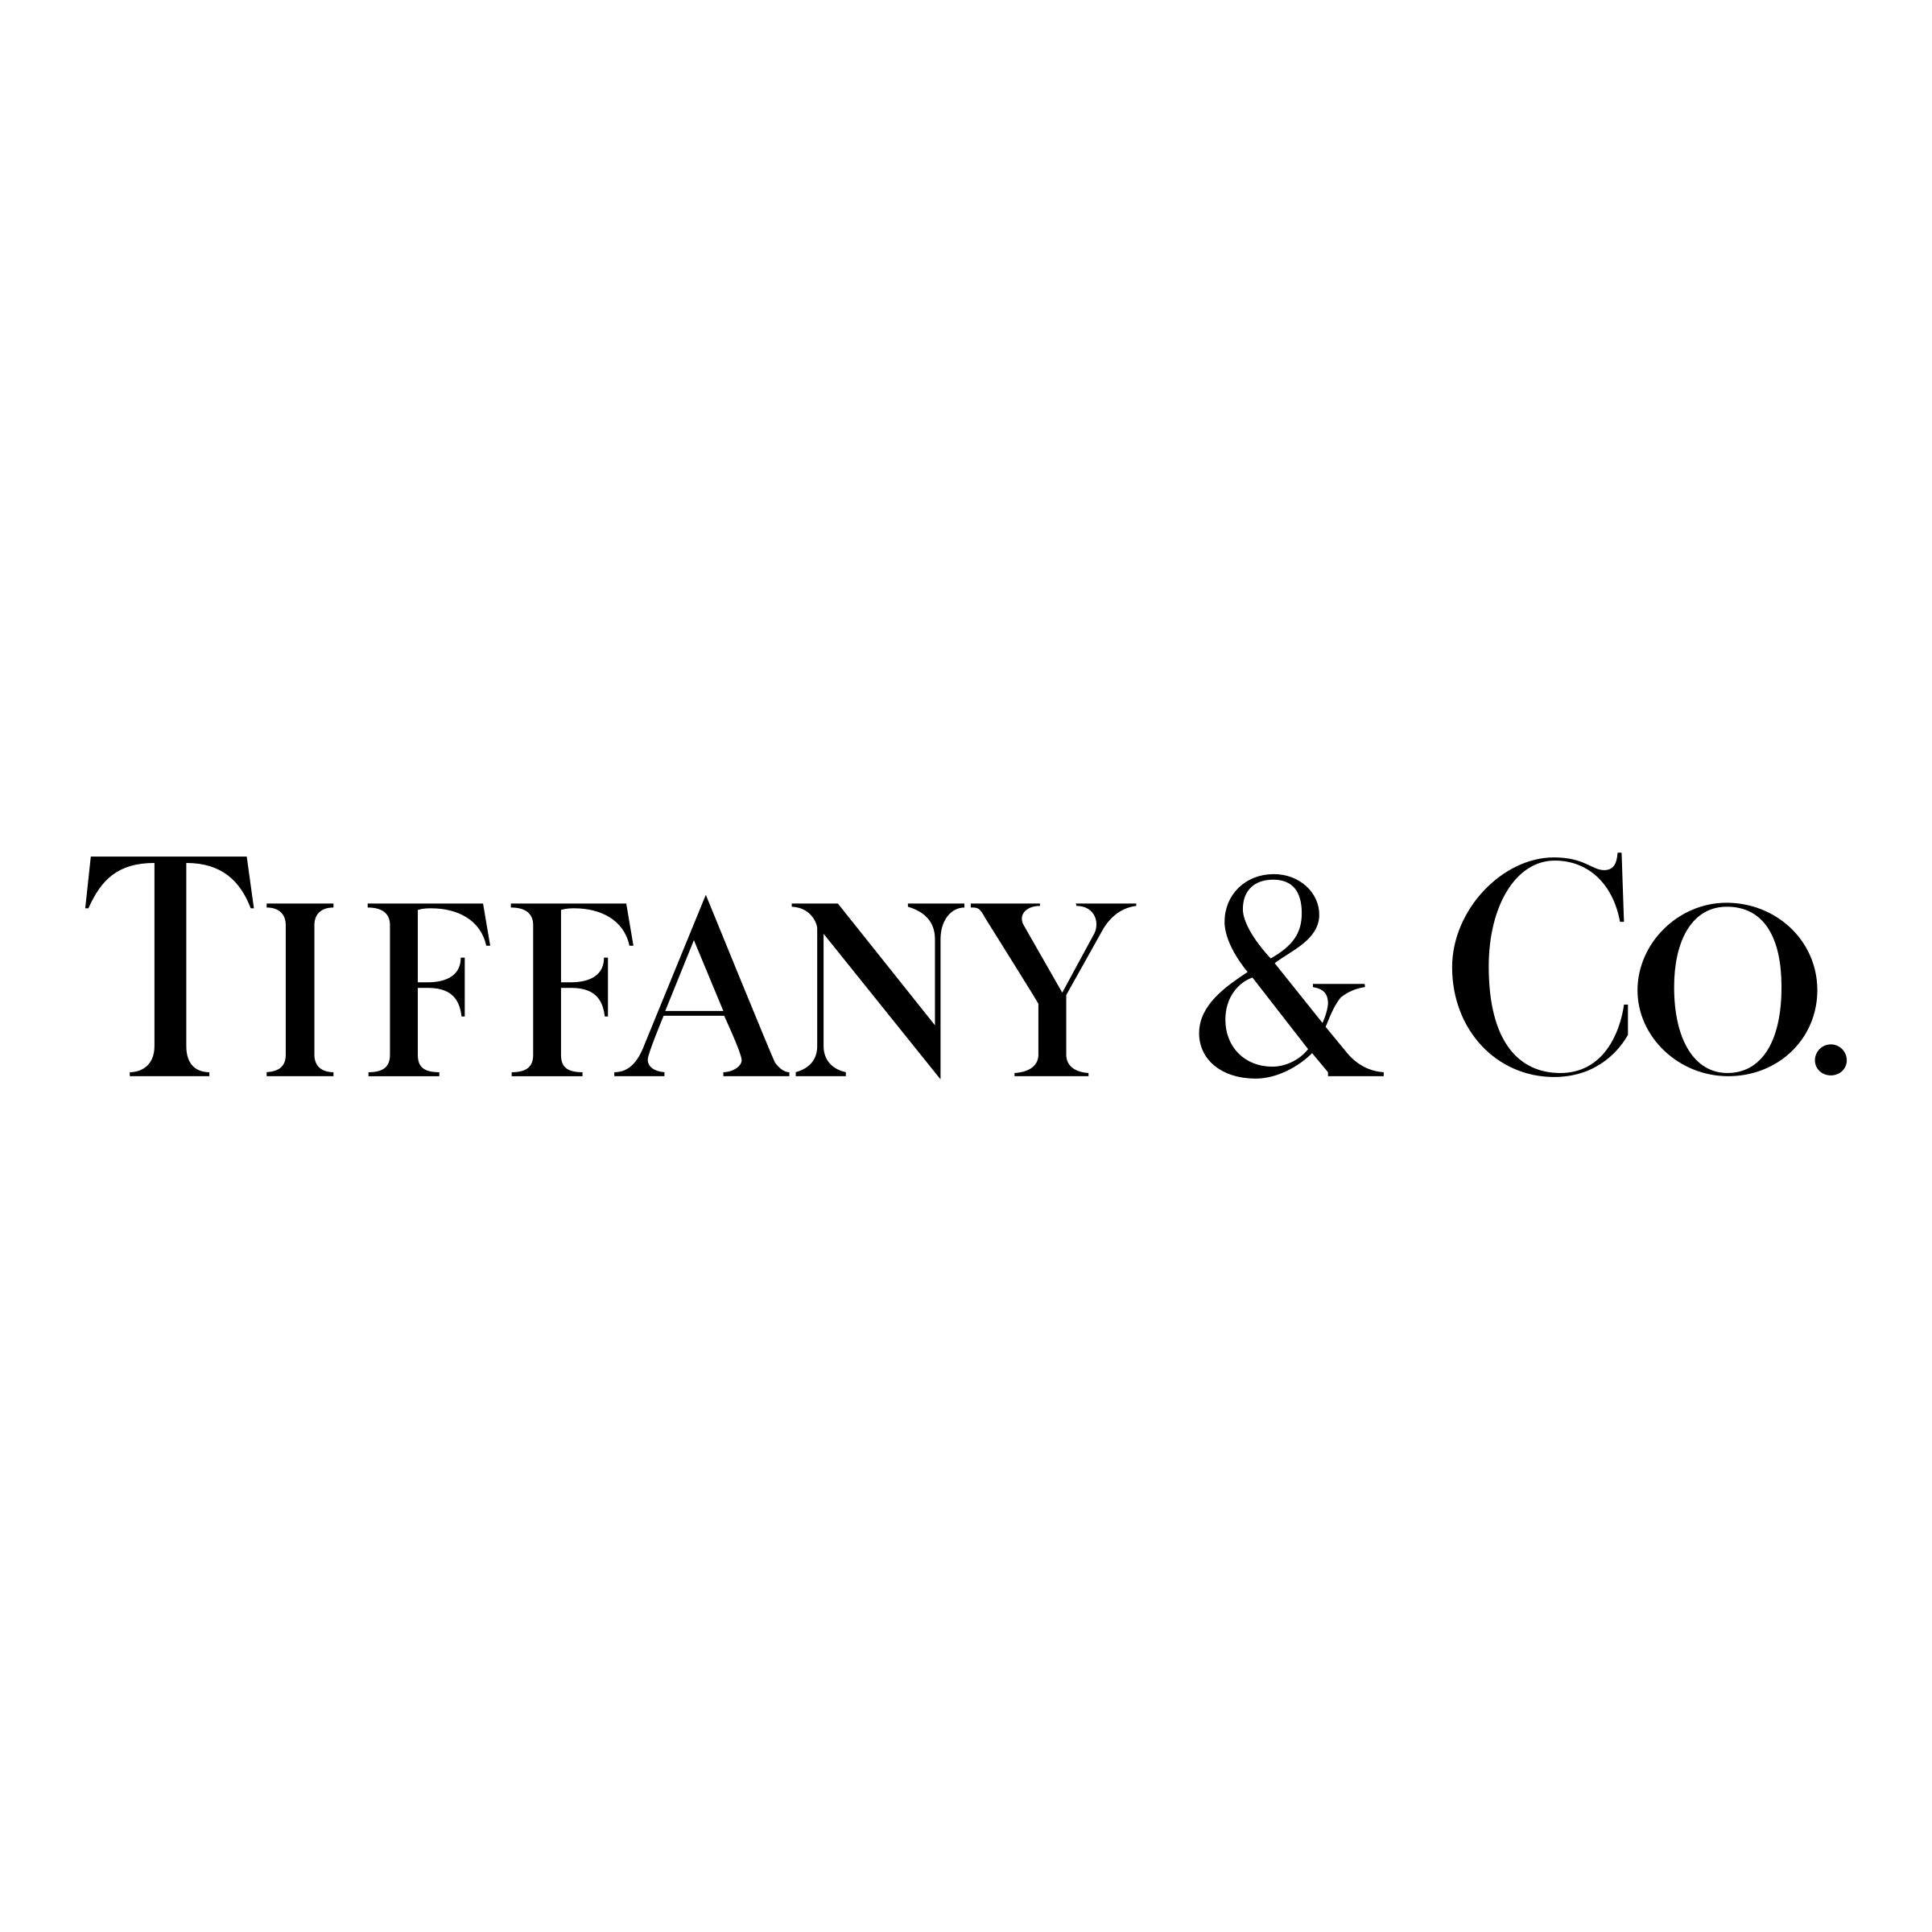 tiffany-co-logo-png